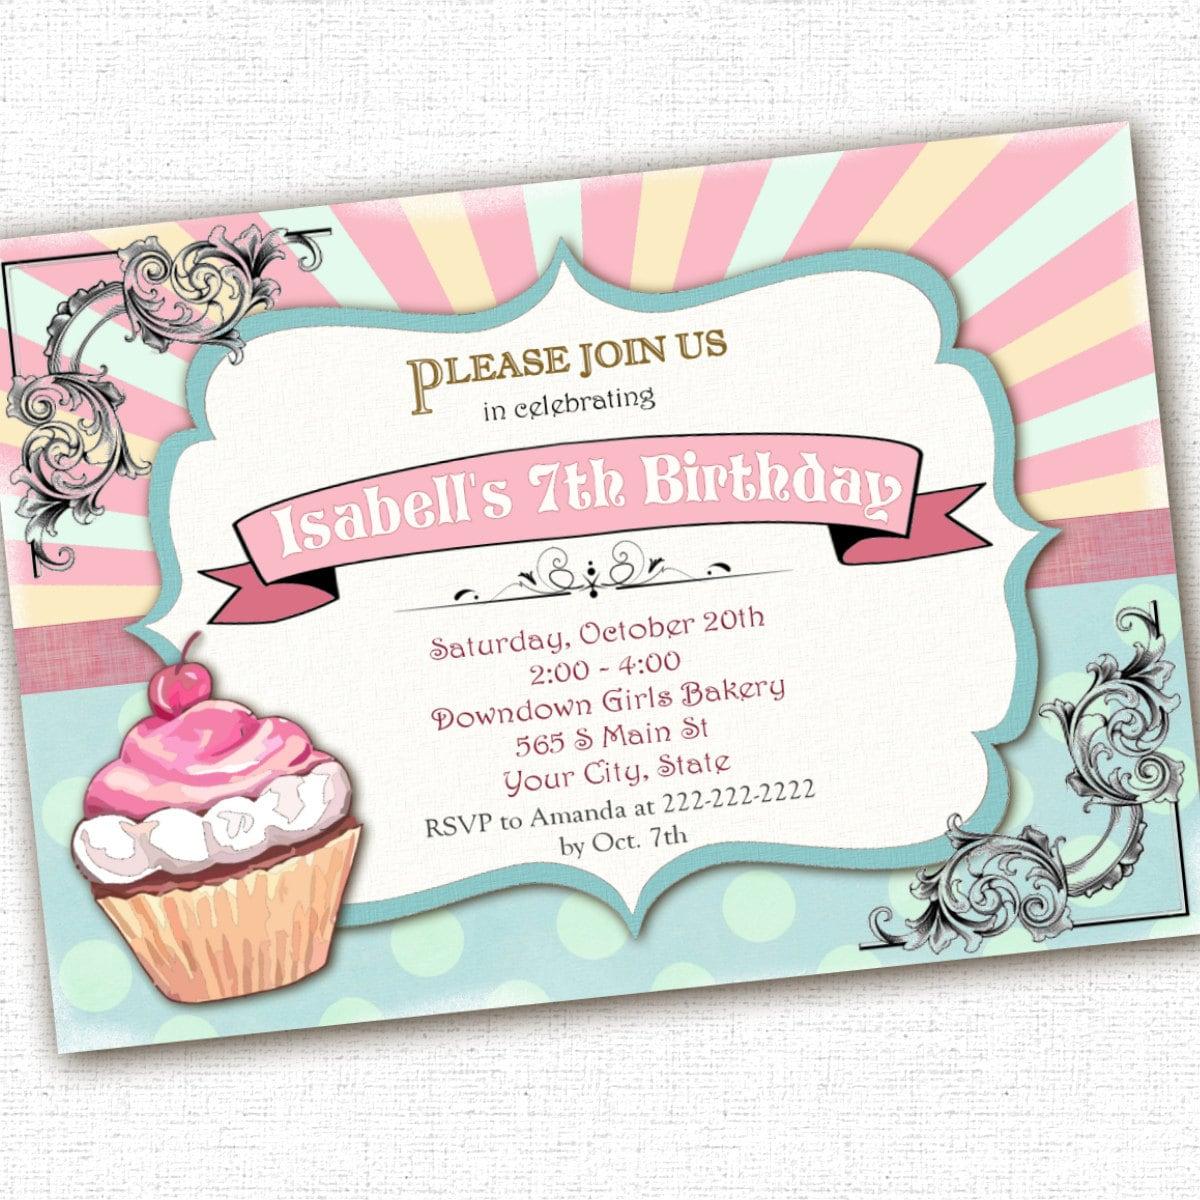 Handmade cupcake birthday party invitations